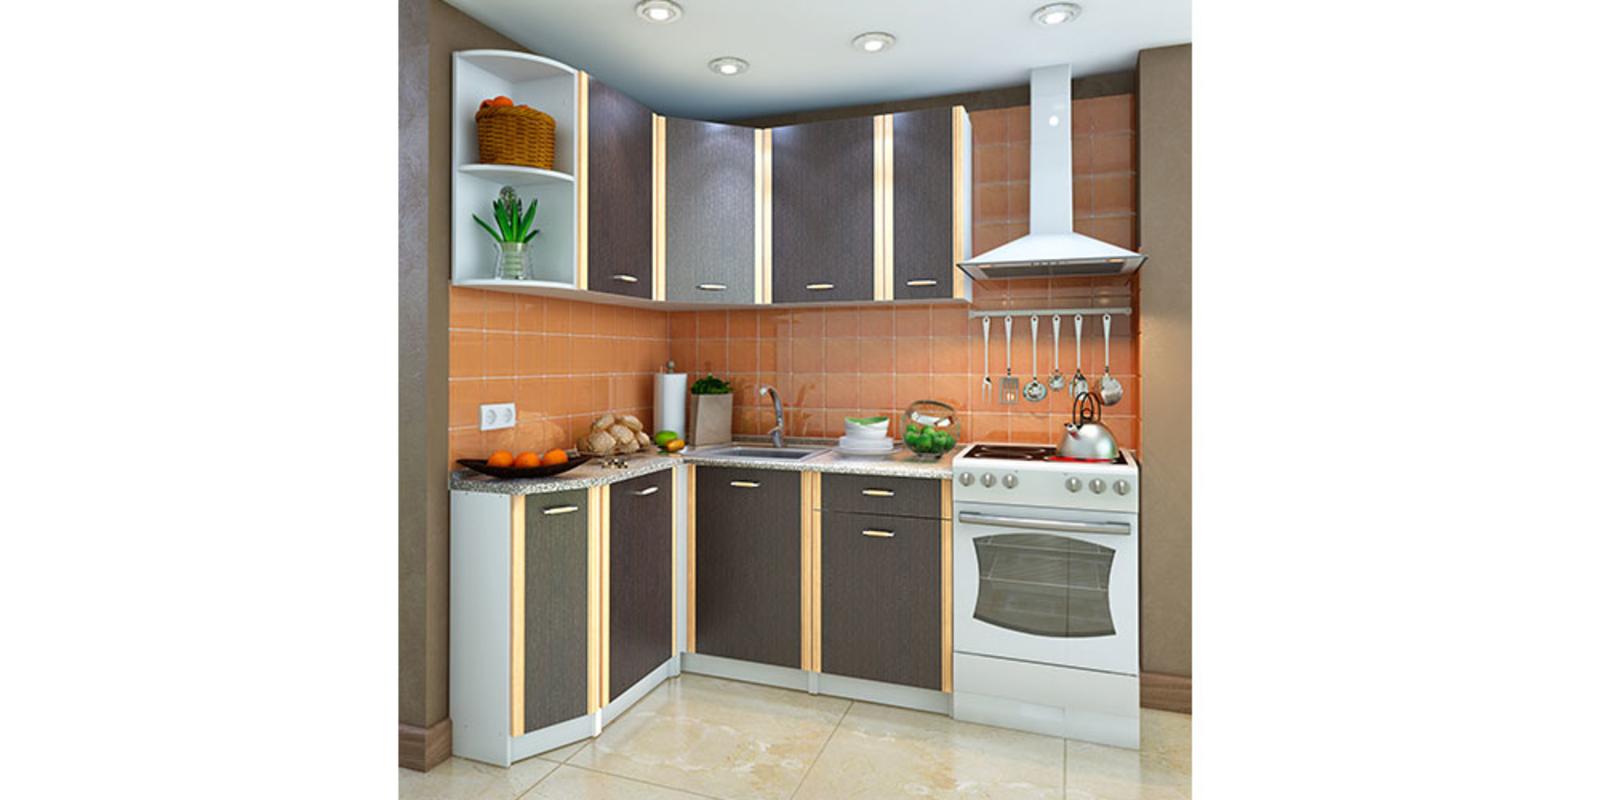 Кухонный гарнитур Лагуна левый угол (белый/венге) Лагуна